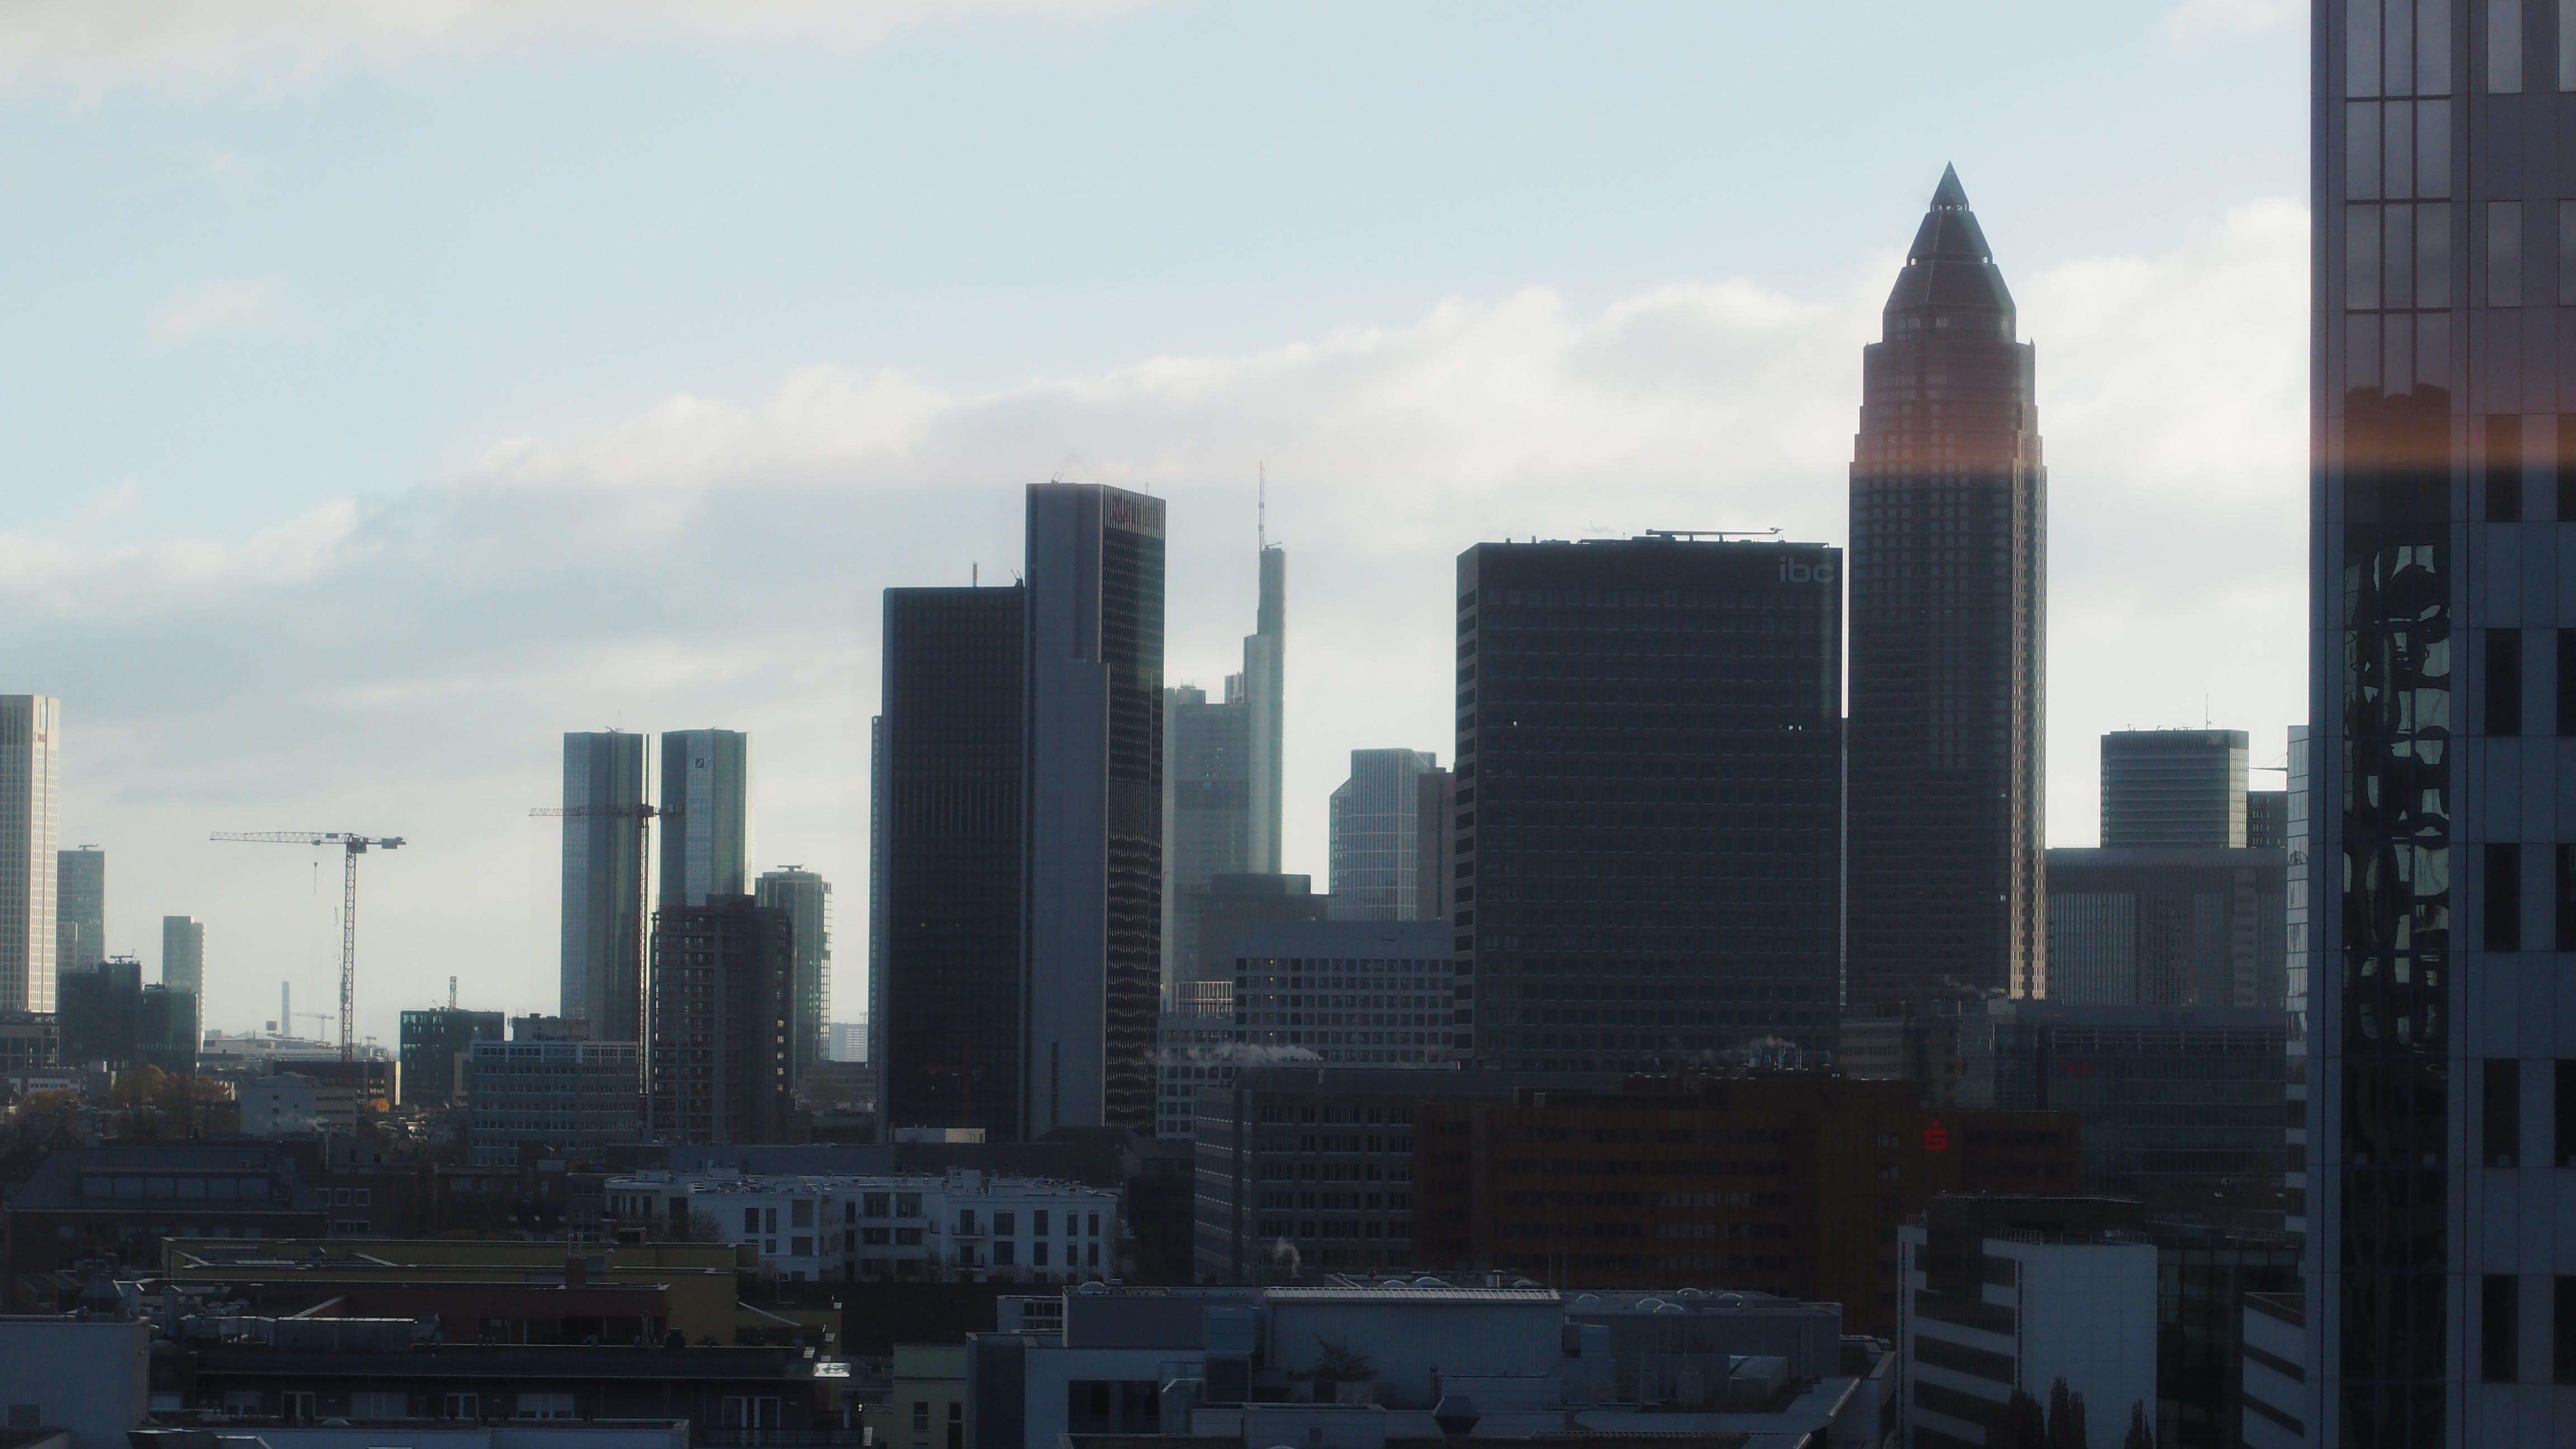 Free stock photo of city view, frankfurt, skyscraper, skyscrapers